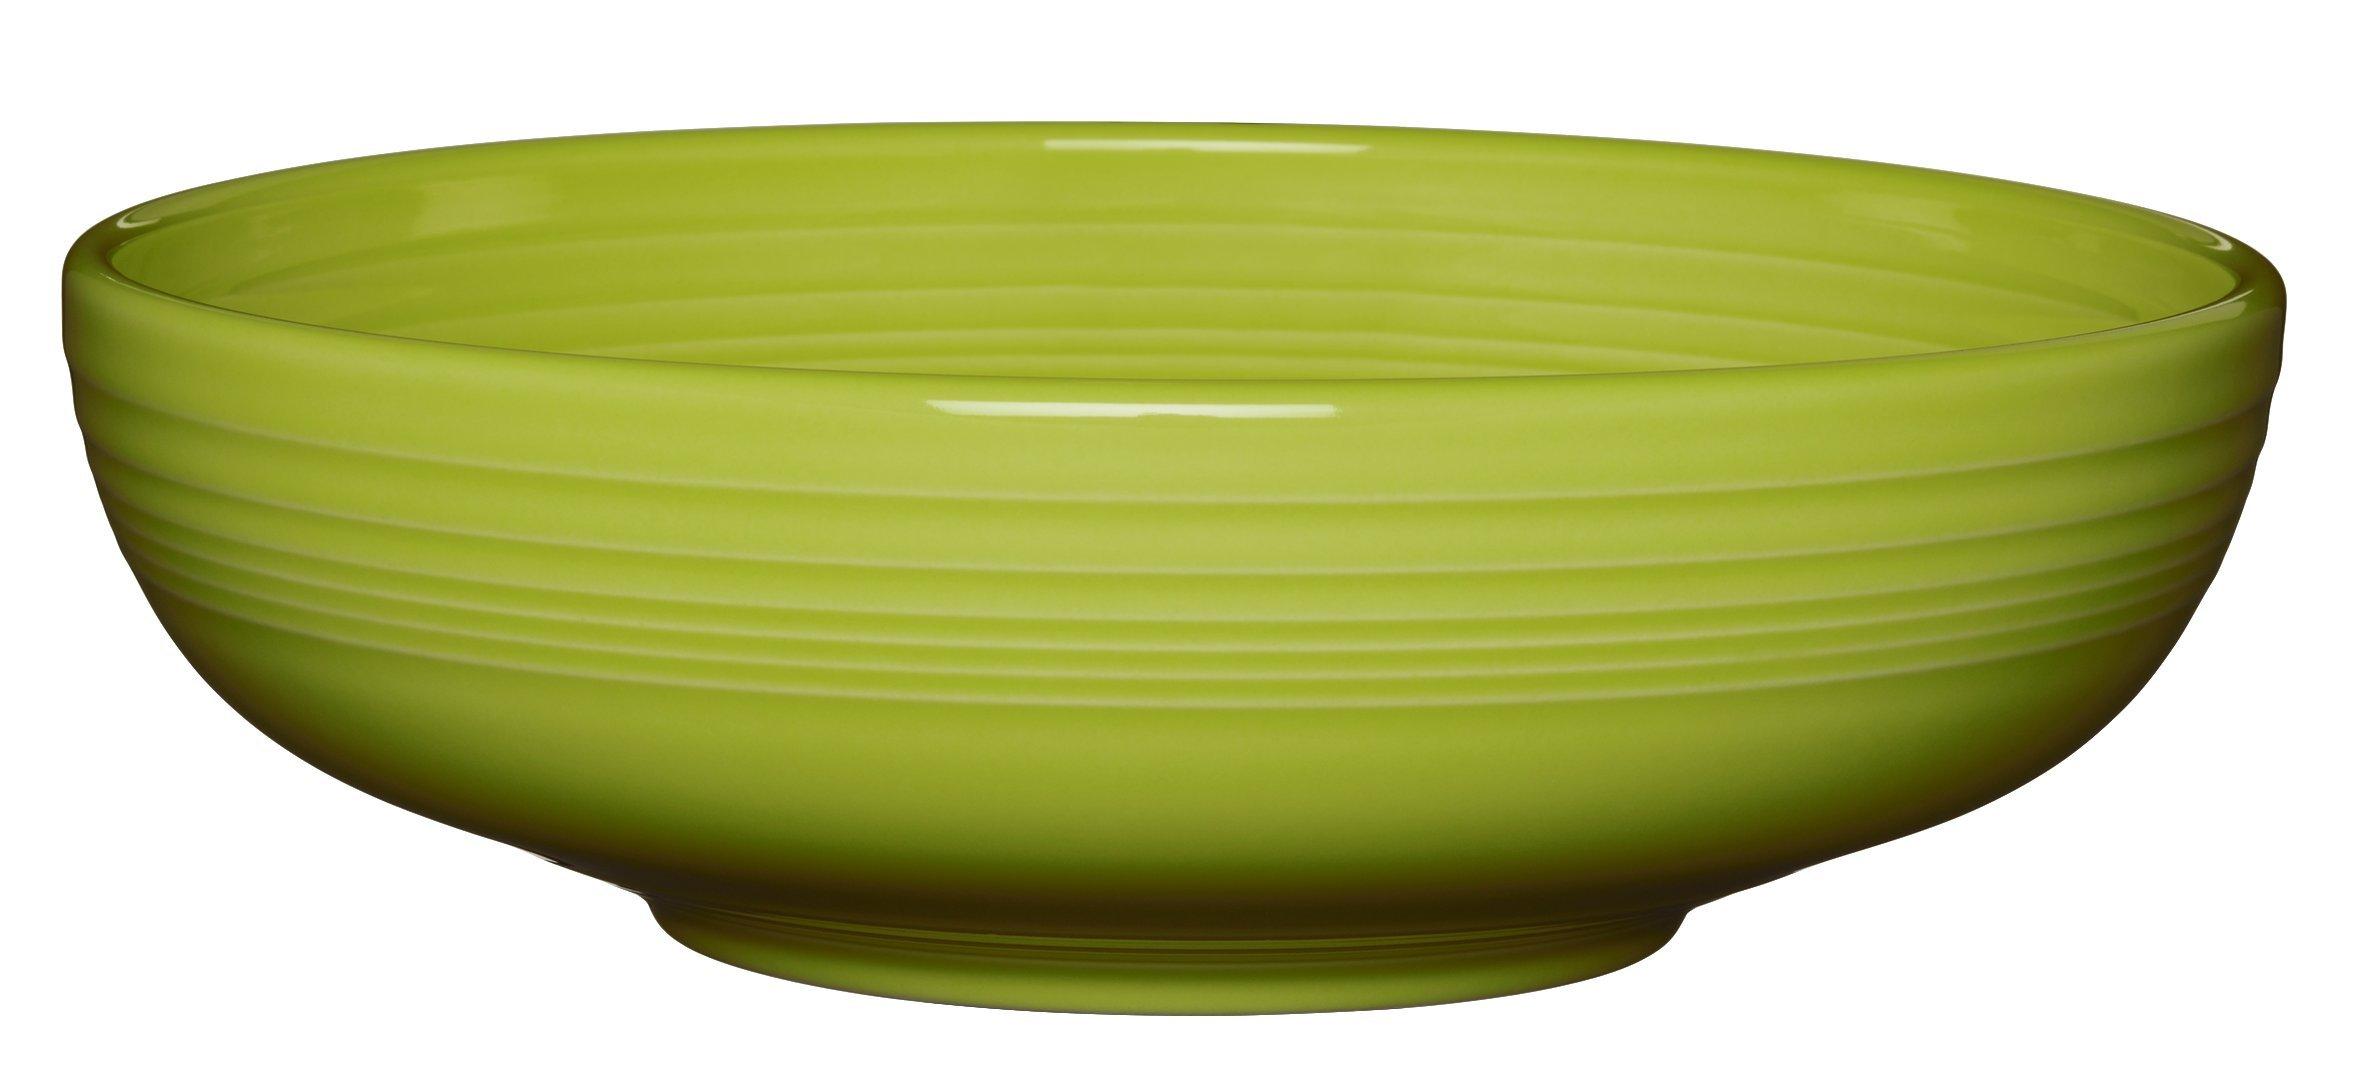 Fiesta Bistro Serving Bowl, 96 oz, Lemongrass